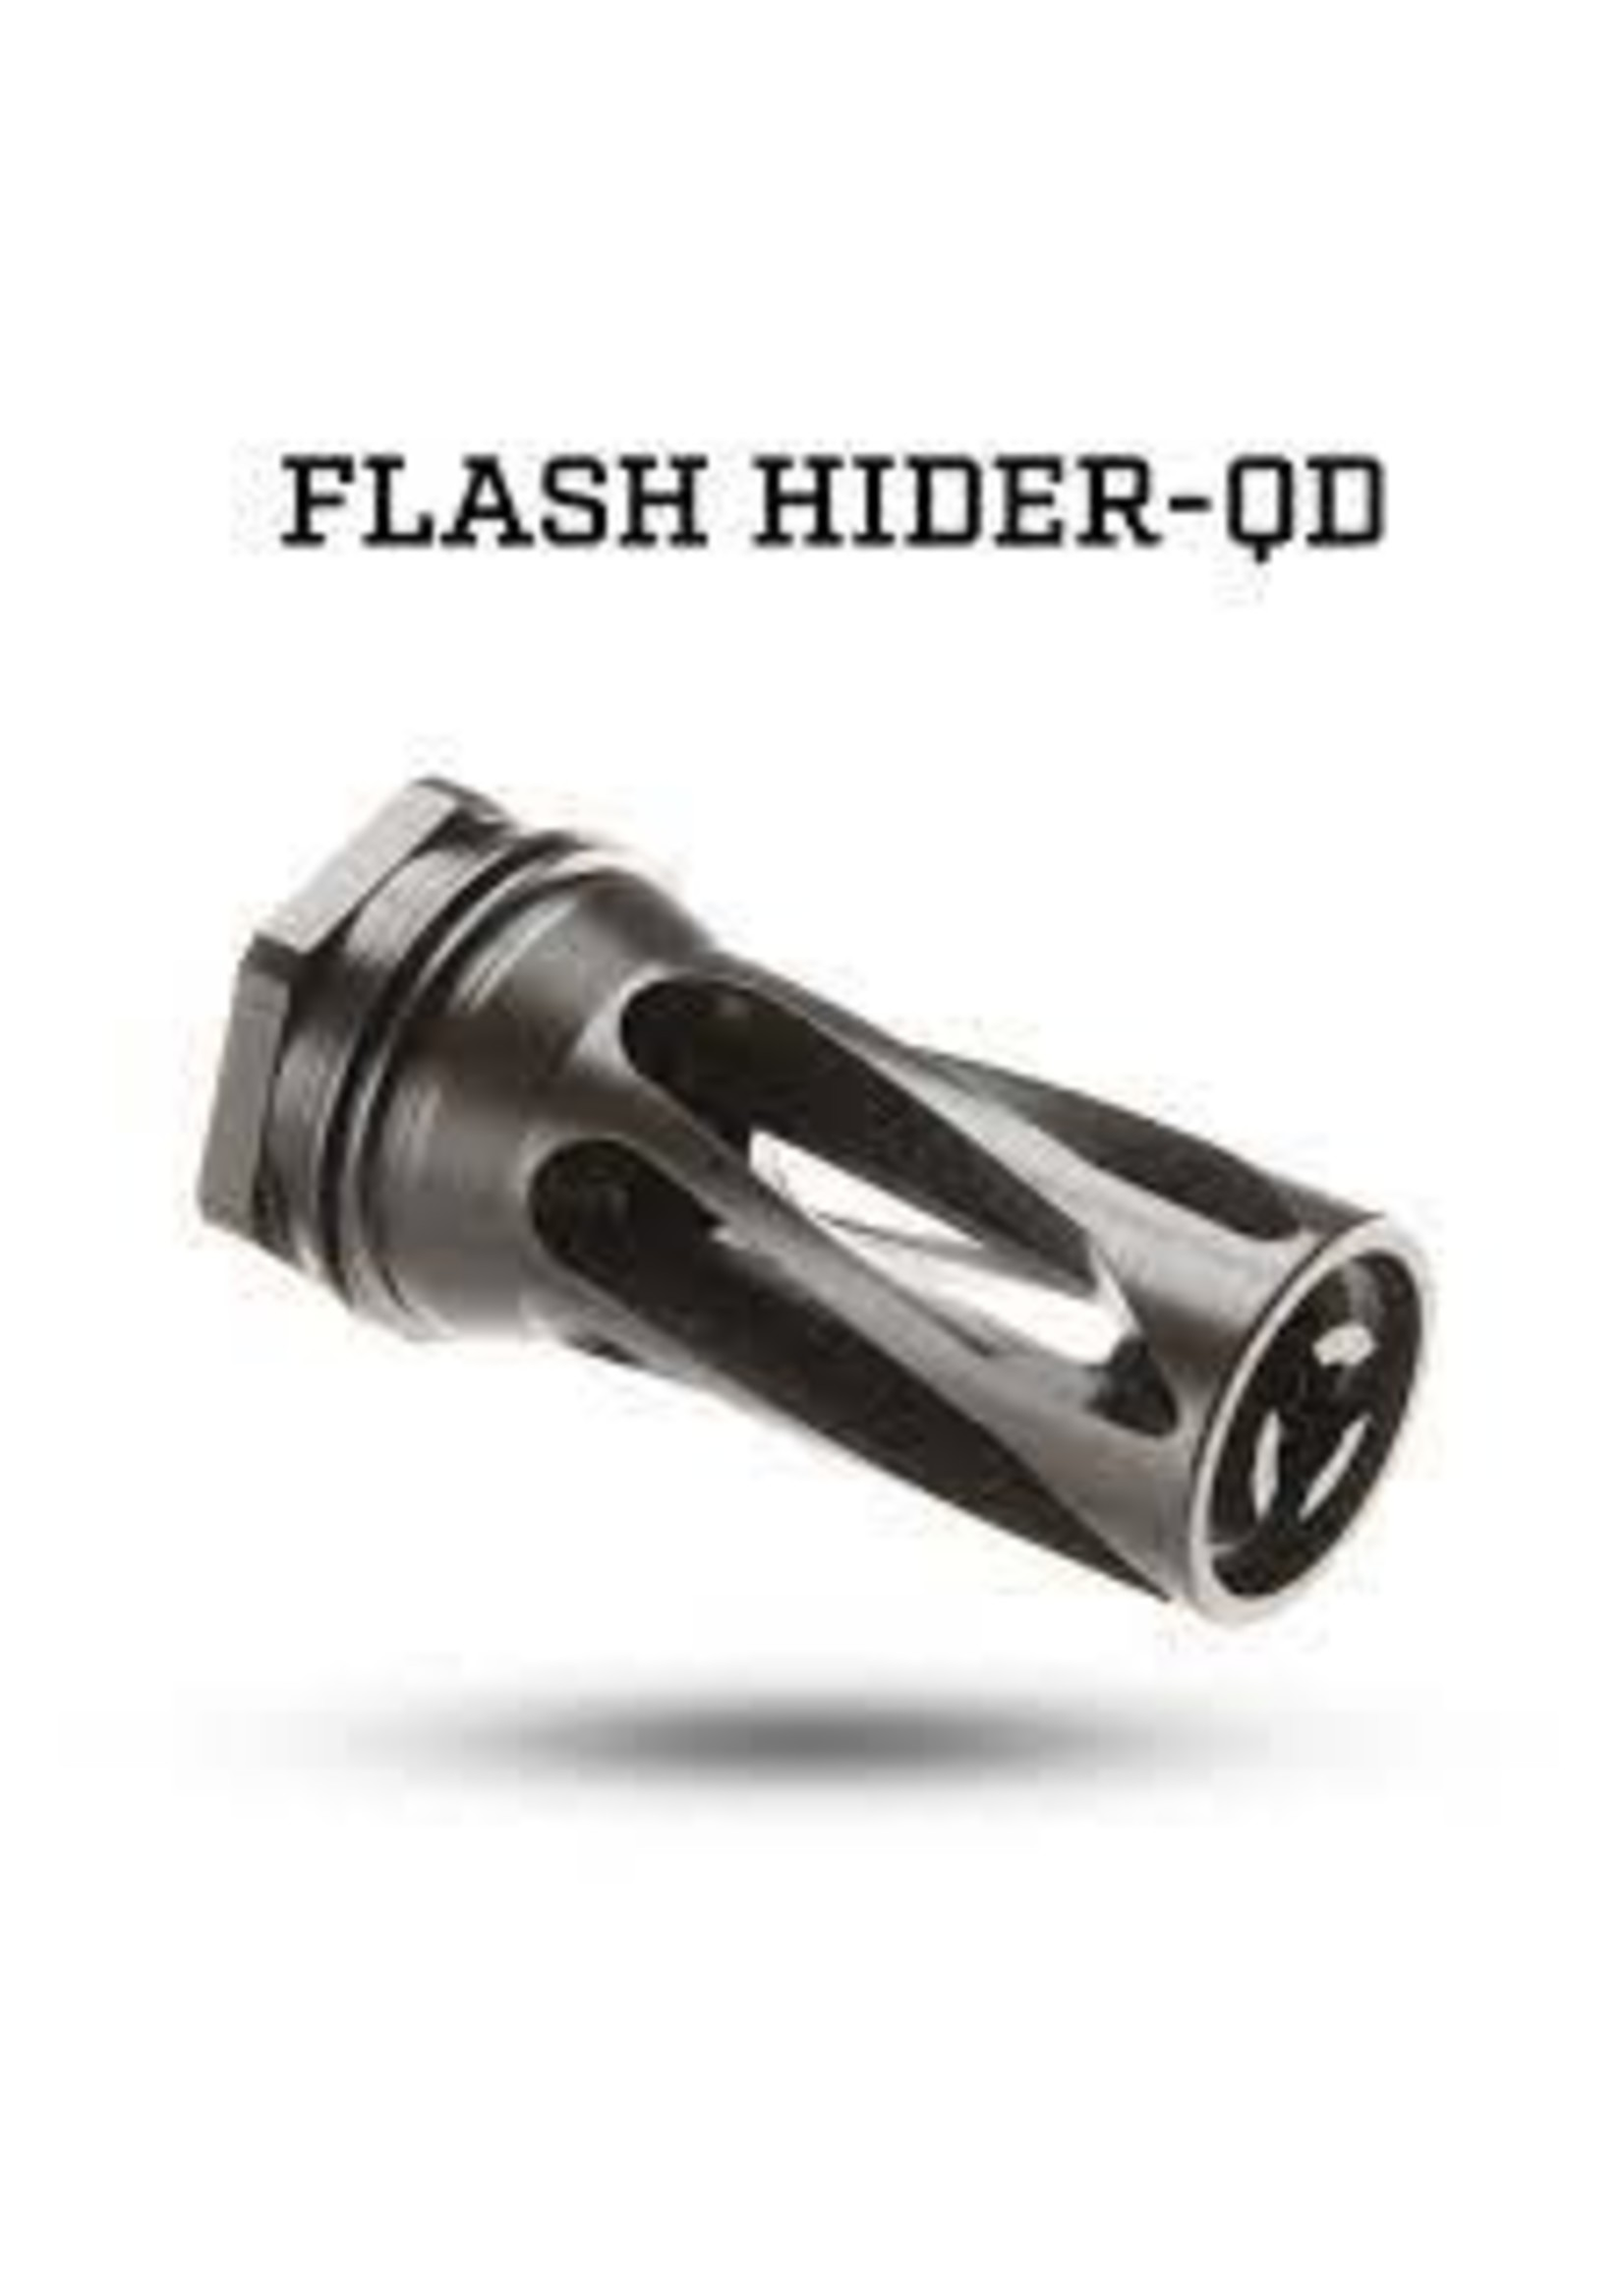 OSS SUPPRESSORS OSS FLASH HIDER-QD 556 1/2-28